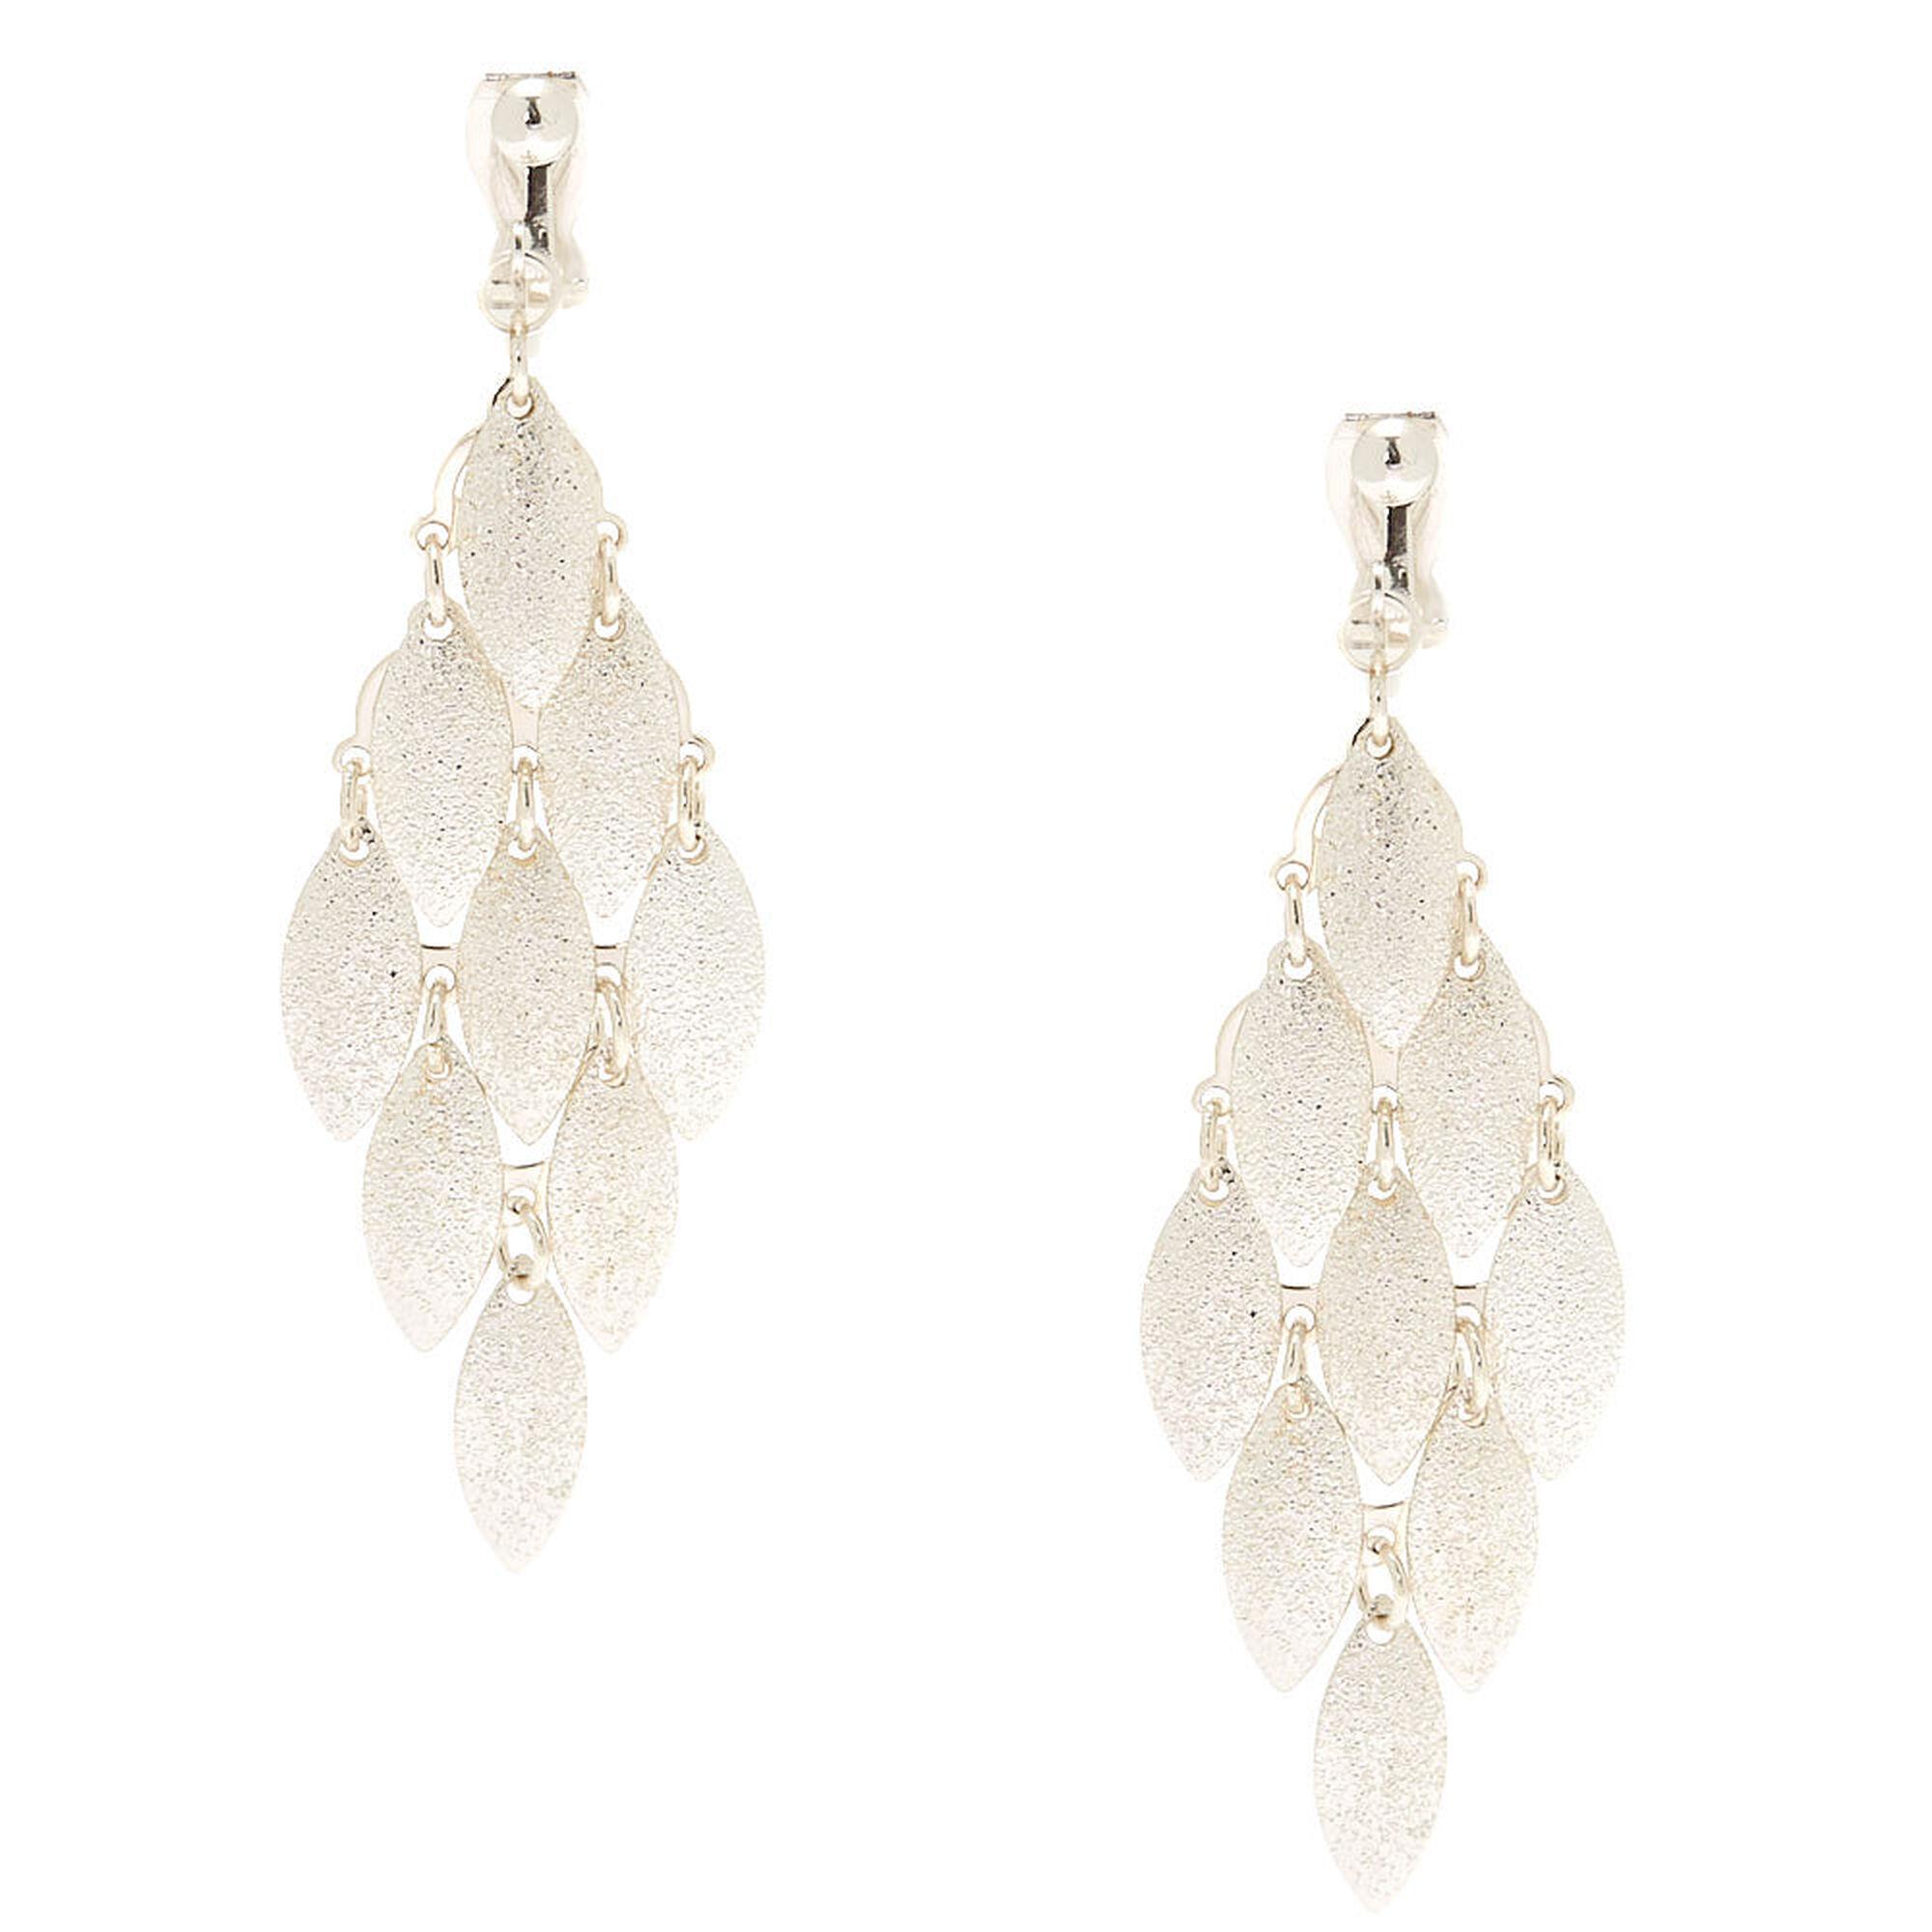 Silver 2 5 Tiered Clip On Drop Earrings